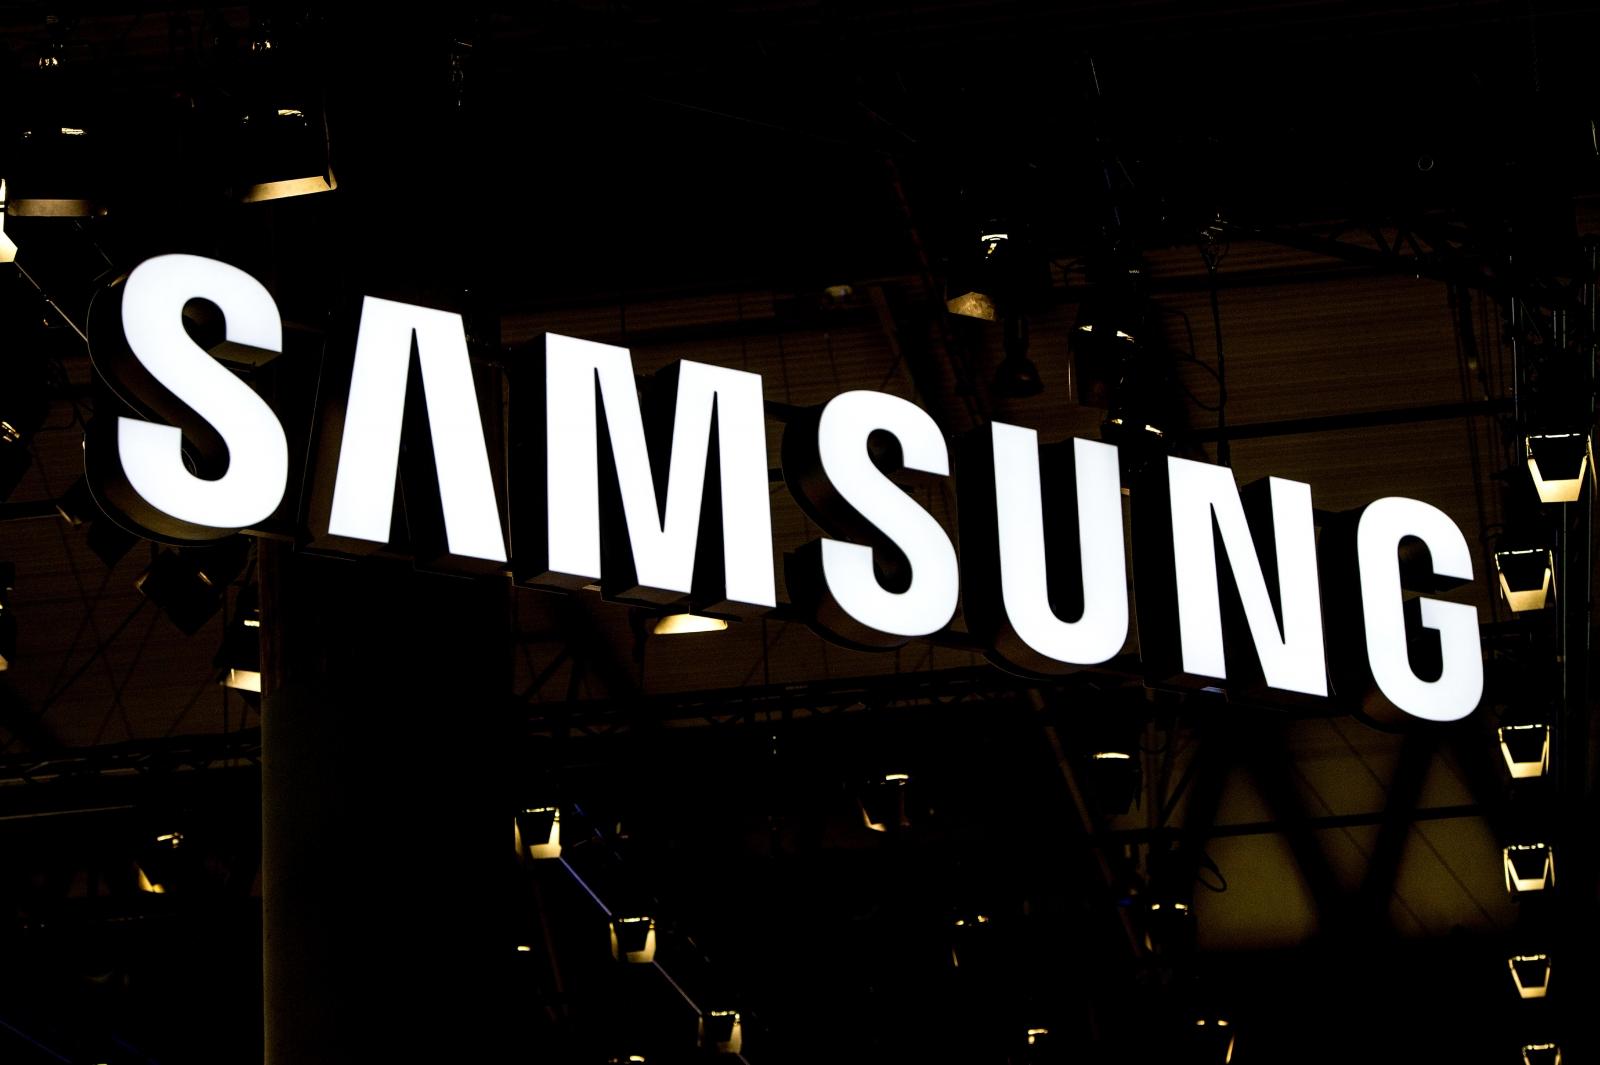 Galaxy S8 to use Exynos 8895